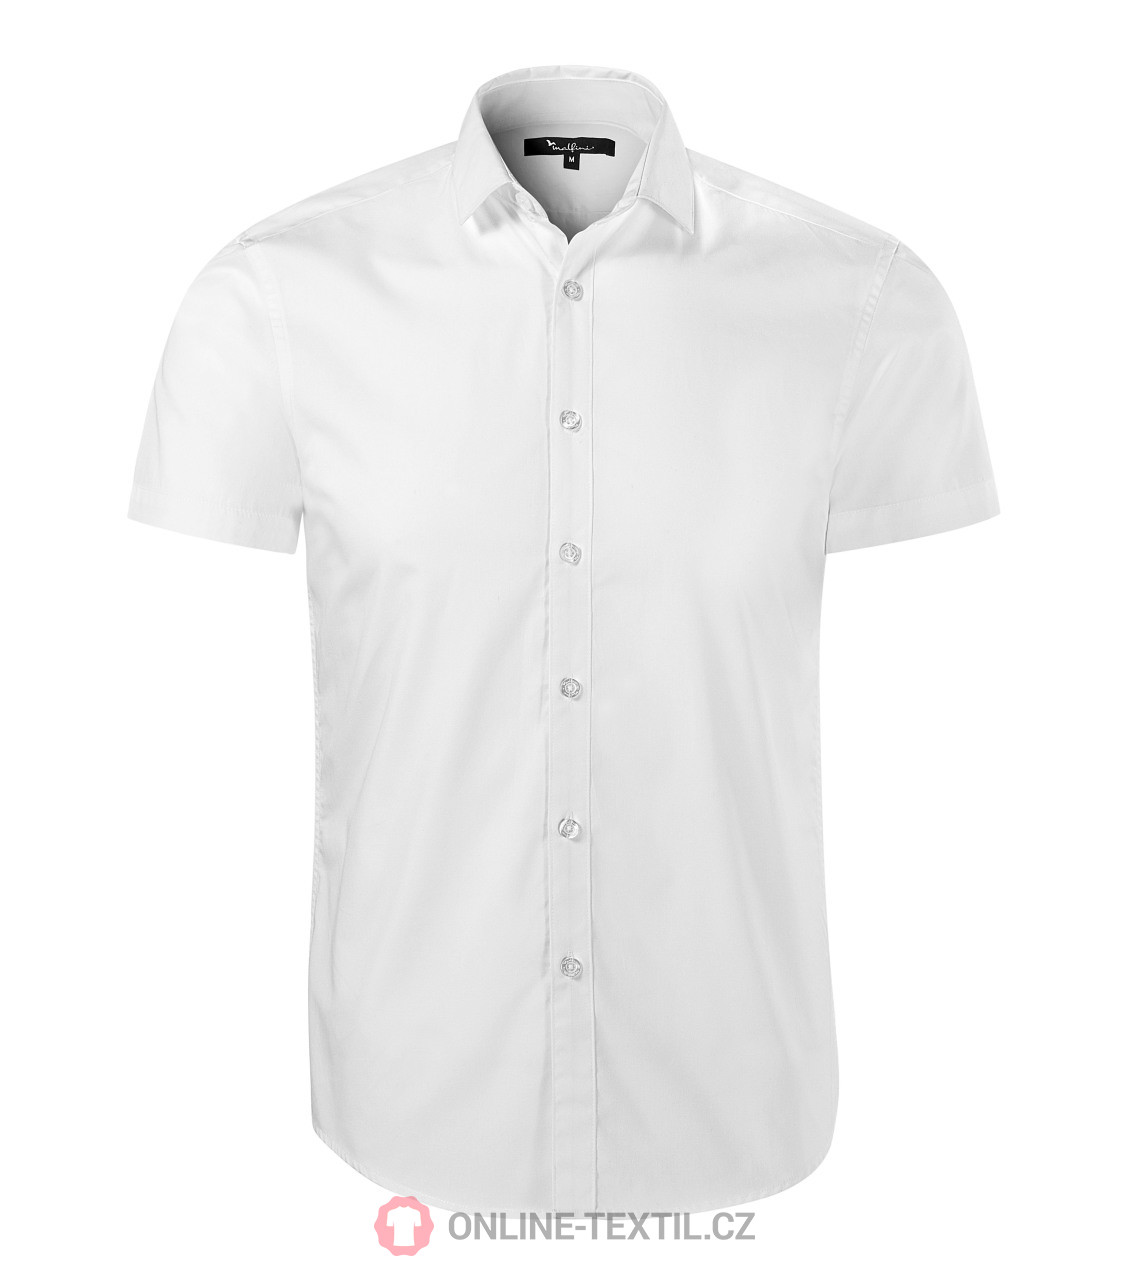 Pánská košile Malfini Premium Flash  Pánská košile Malfini Premium Flash ... 5e8d49b8d9